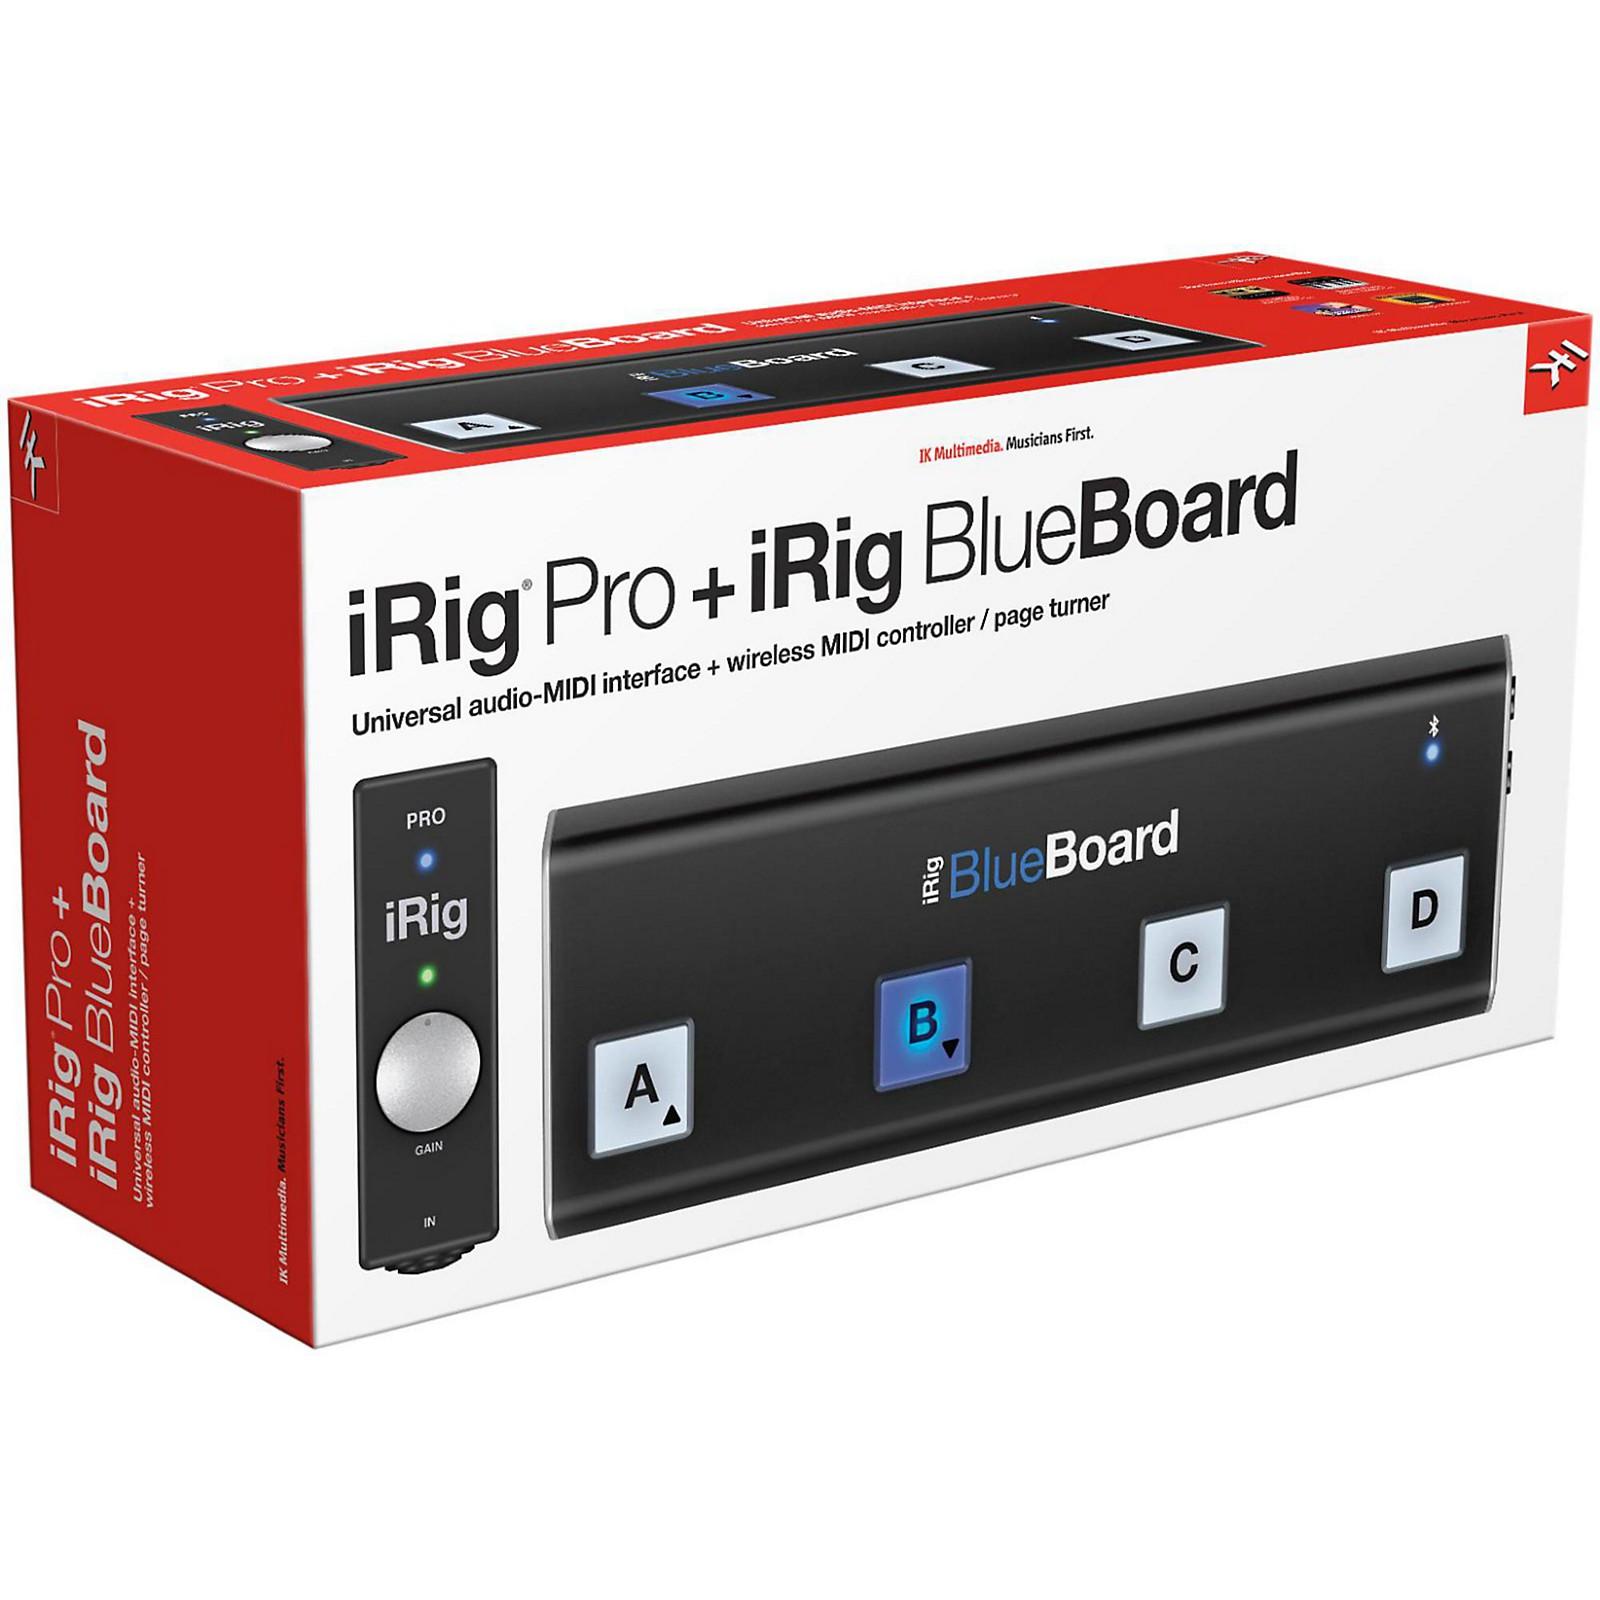 Ik Multimedia Irig Pro: IK Multimedia IRig Bundle Pro + Bboard